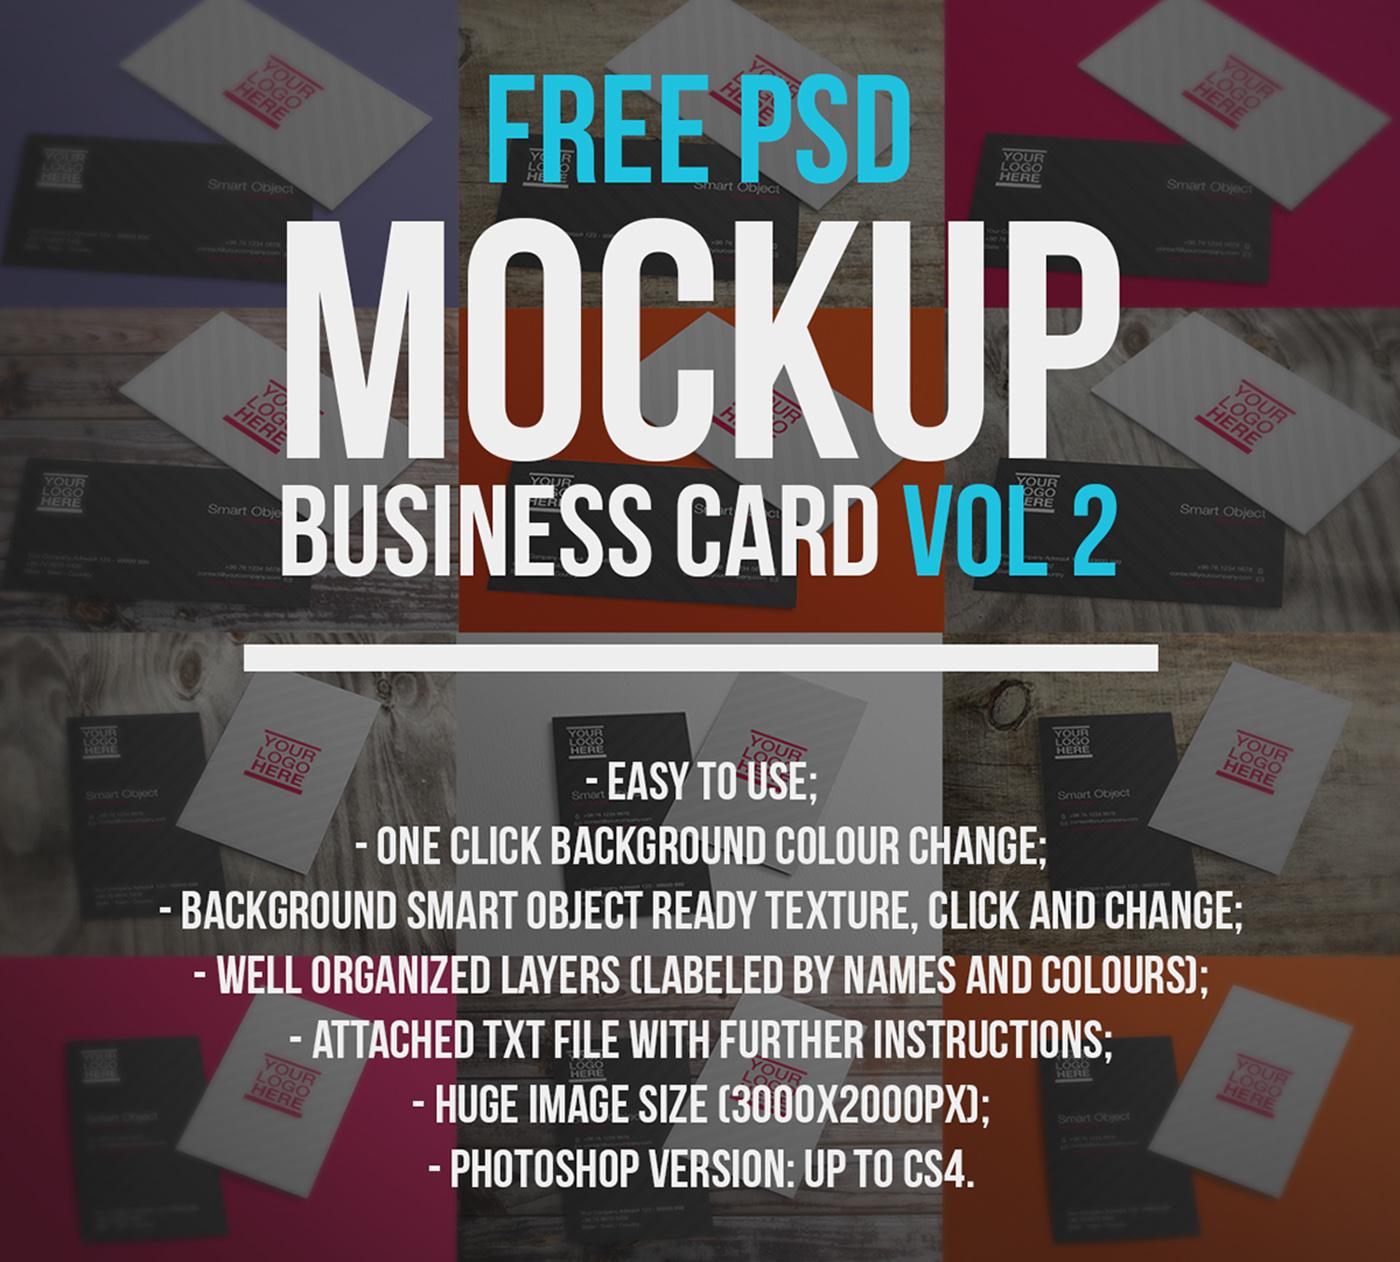 free,psd,photoshop,mock up,free mockup ,free mock up,mock up free,mockup free,Mockup,template,cartão,visitas,Cartão de Visita